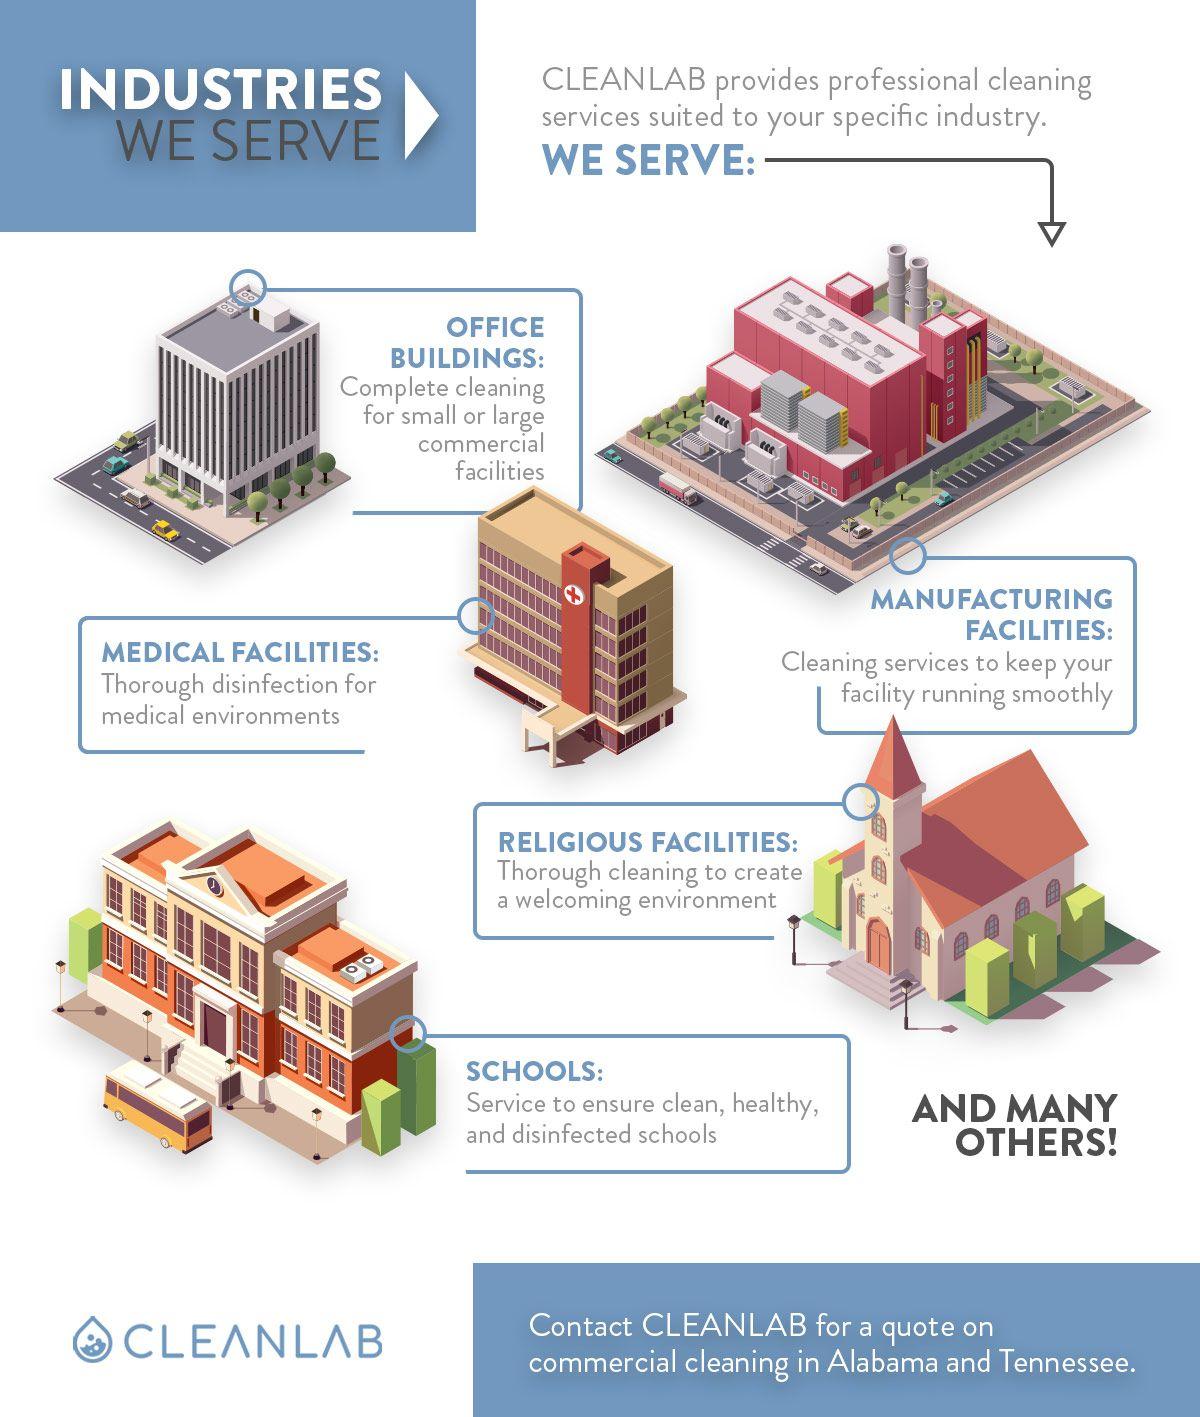 Industries We Serve_Infographic.jpg